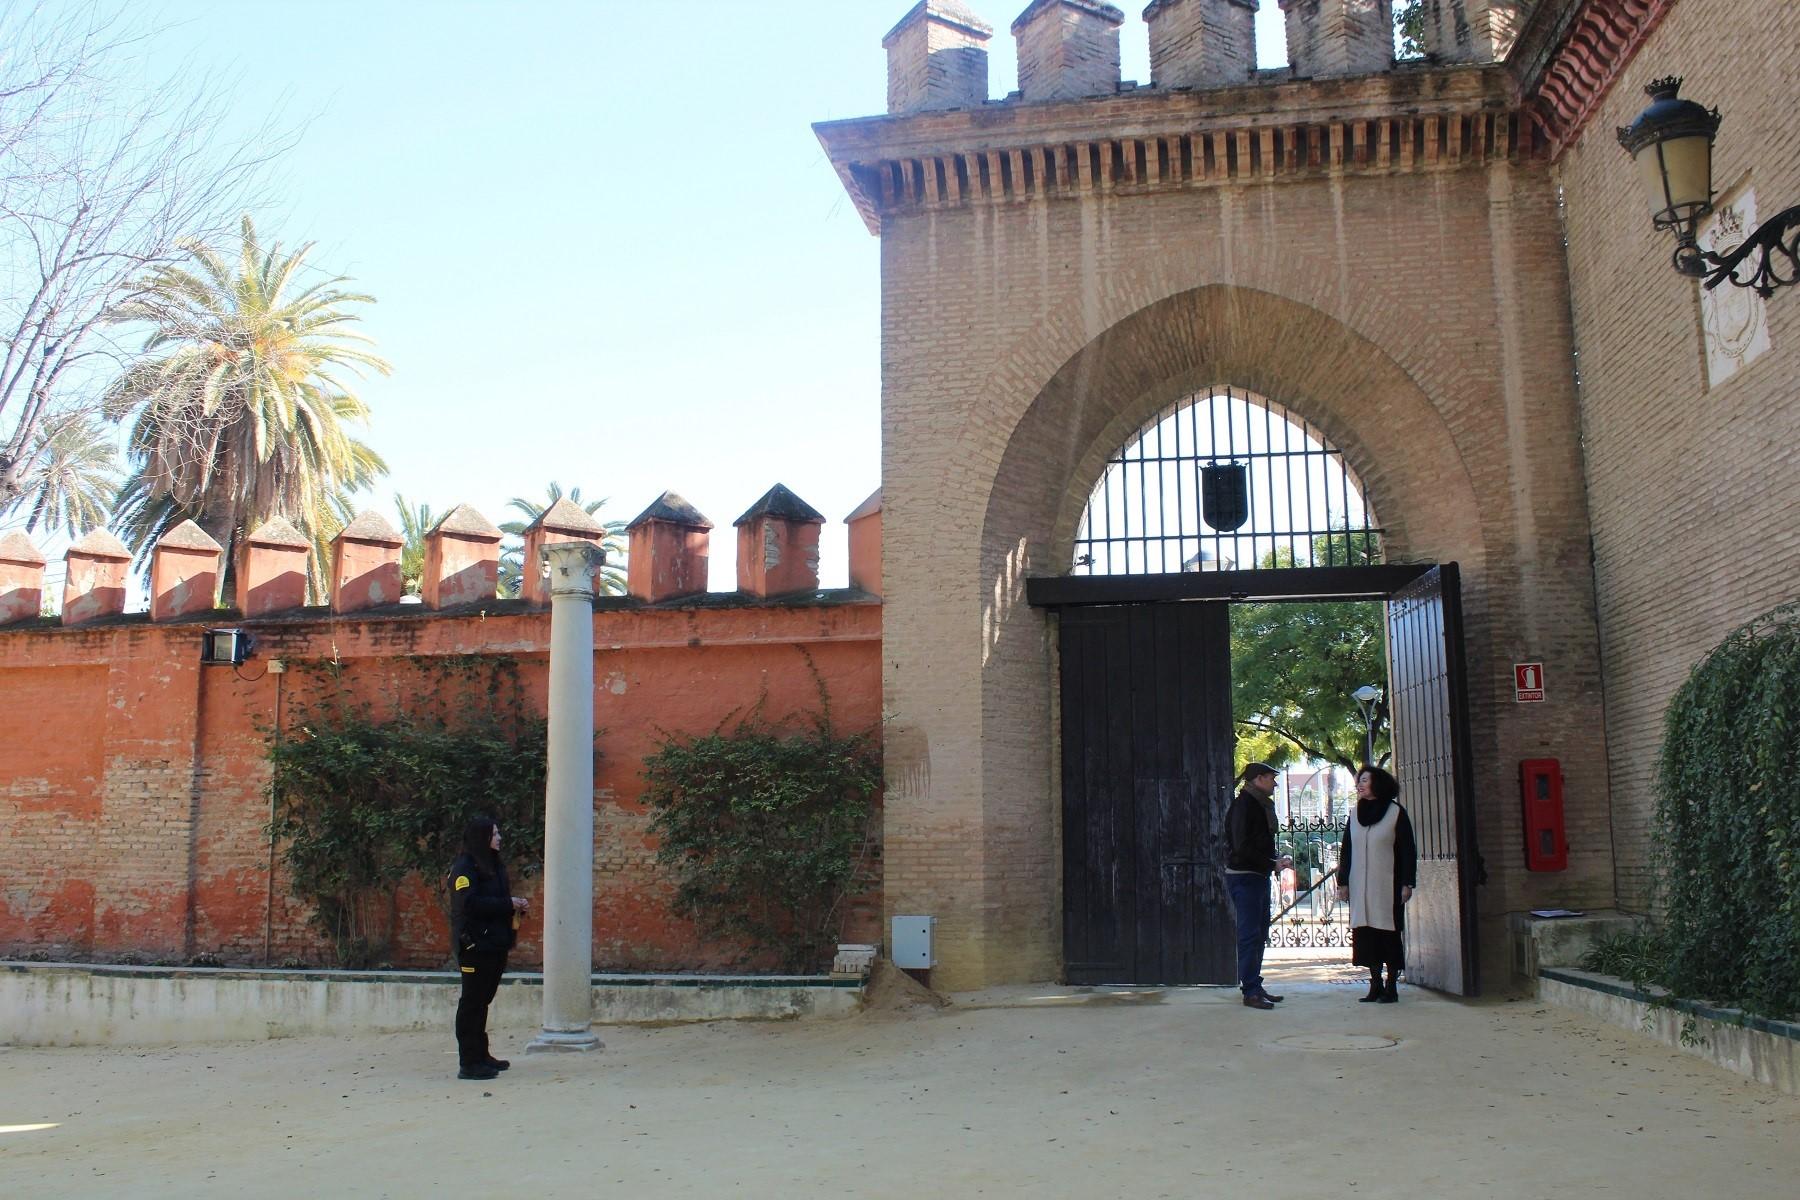 Puerta Alcoba Alcazar Sevilla